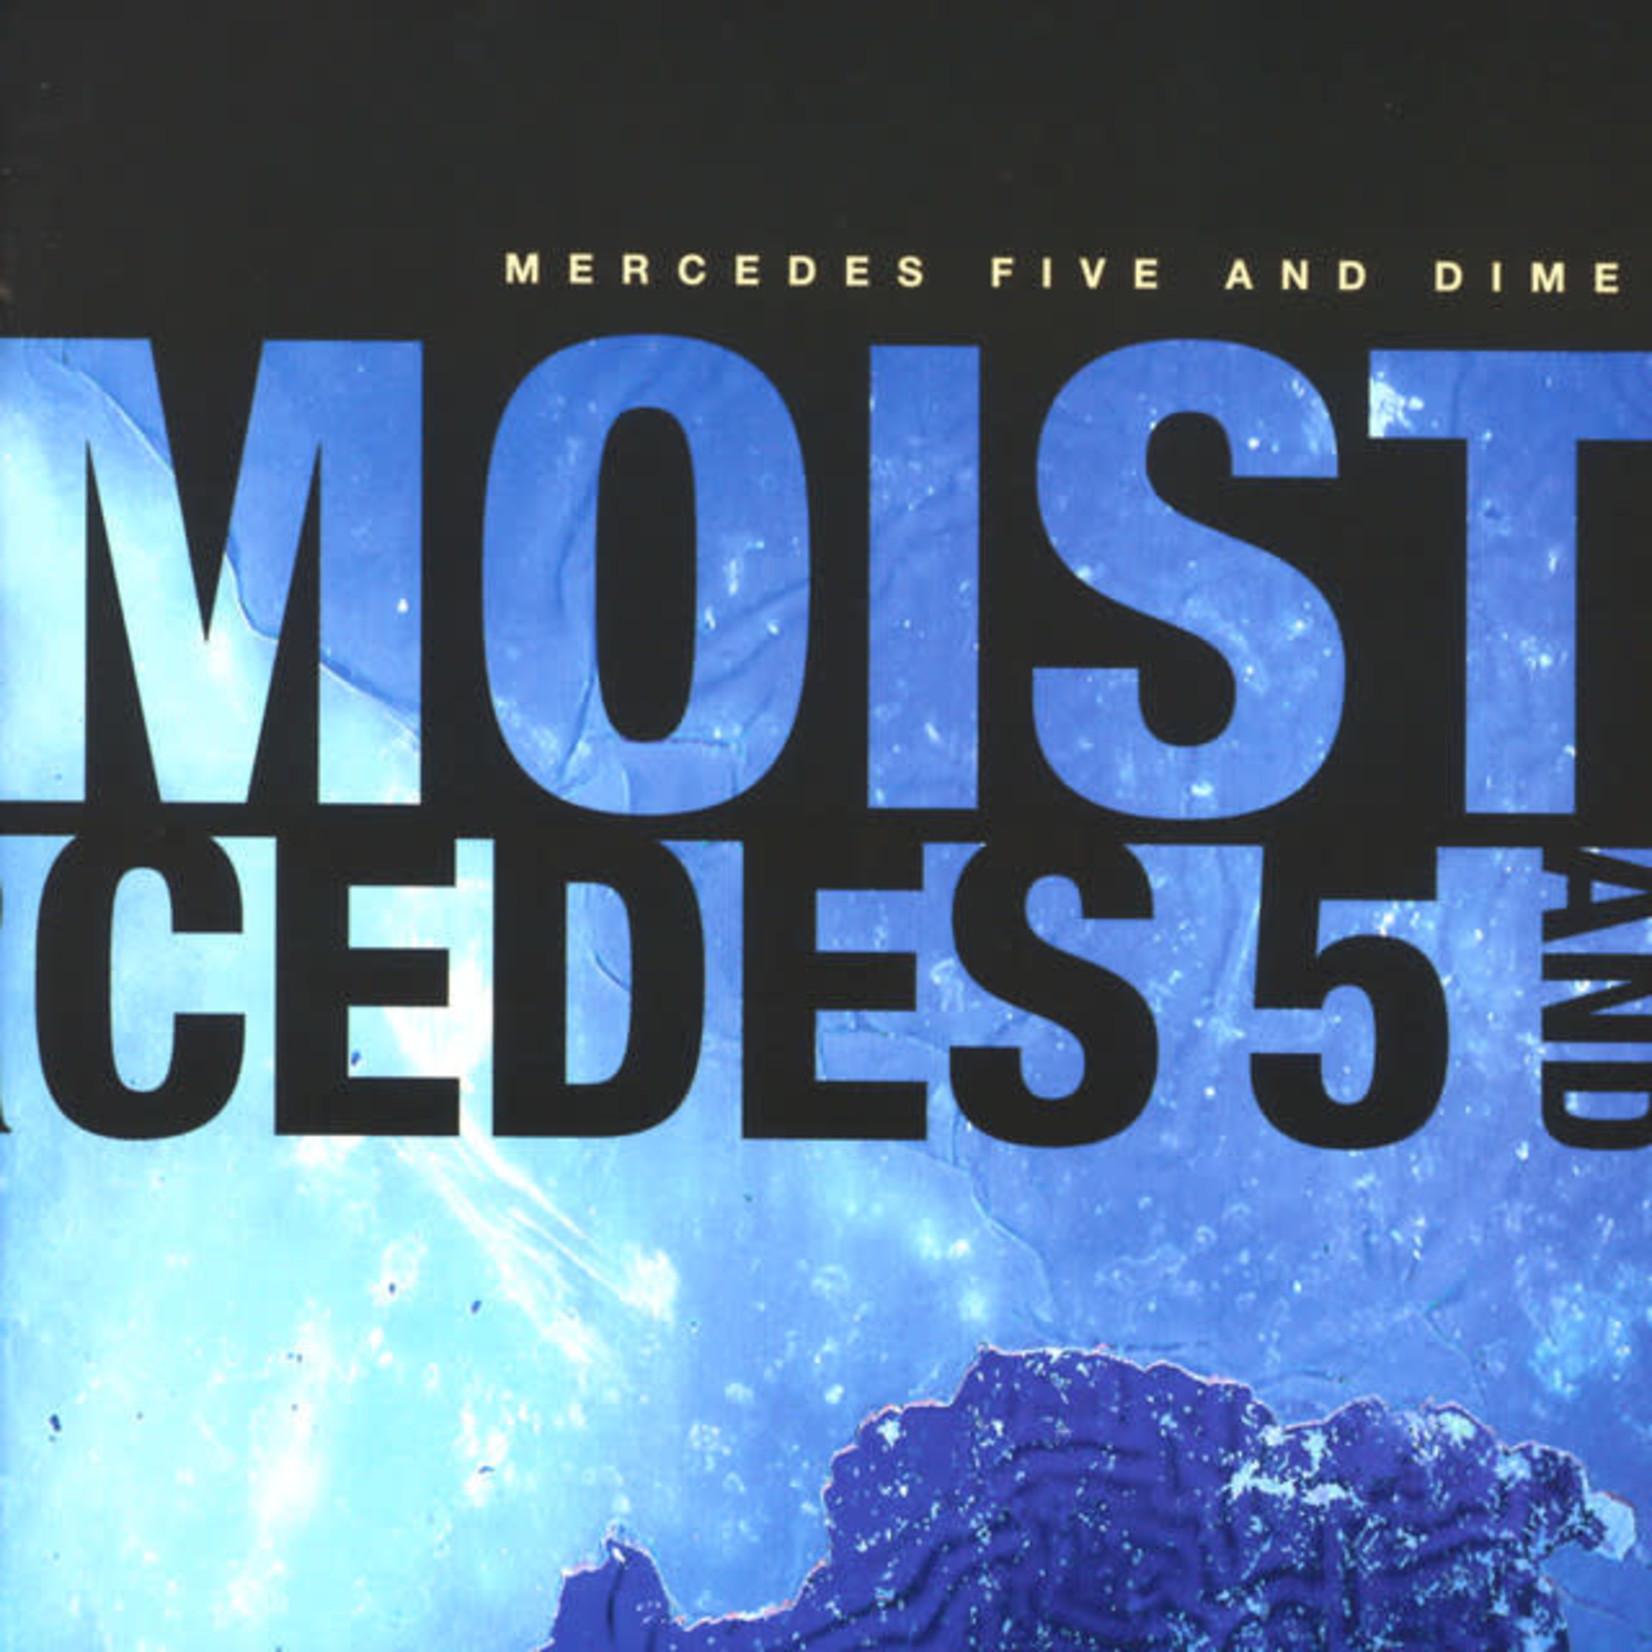 Vinyl Moist - Mercedes Fine and Dime